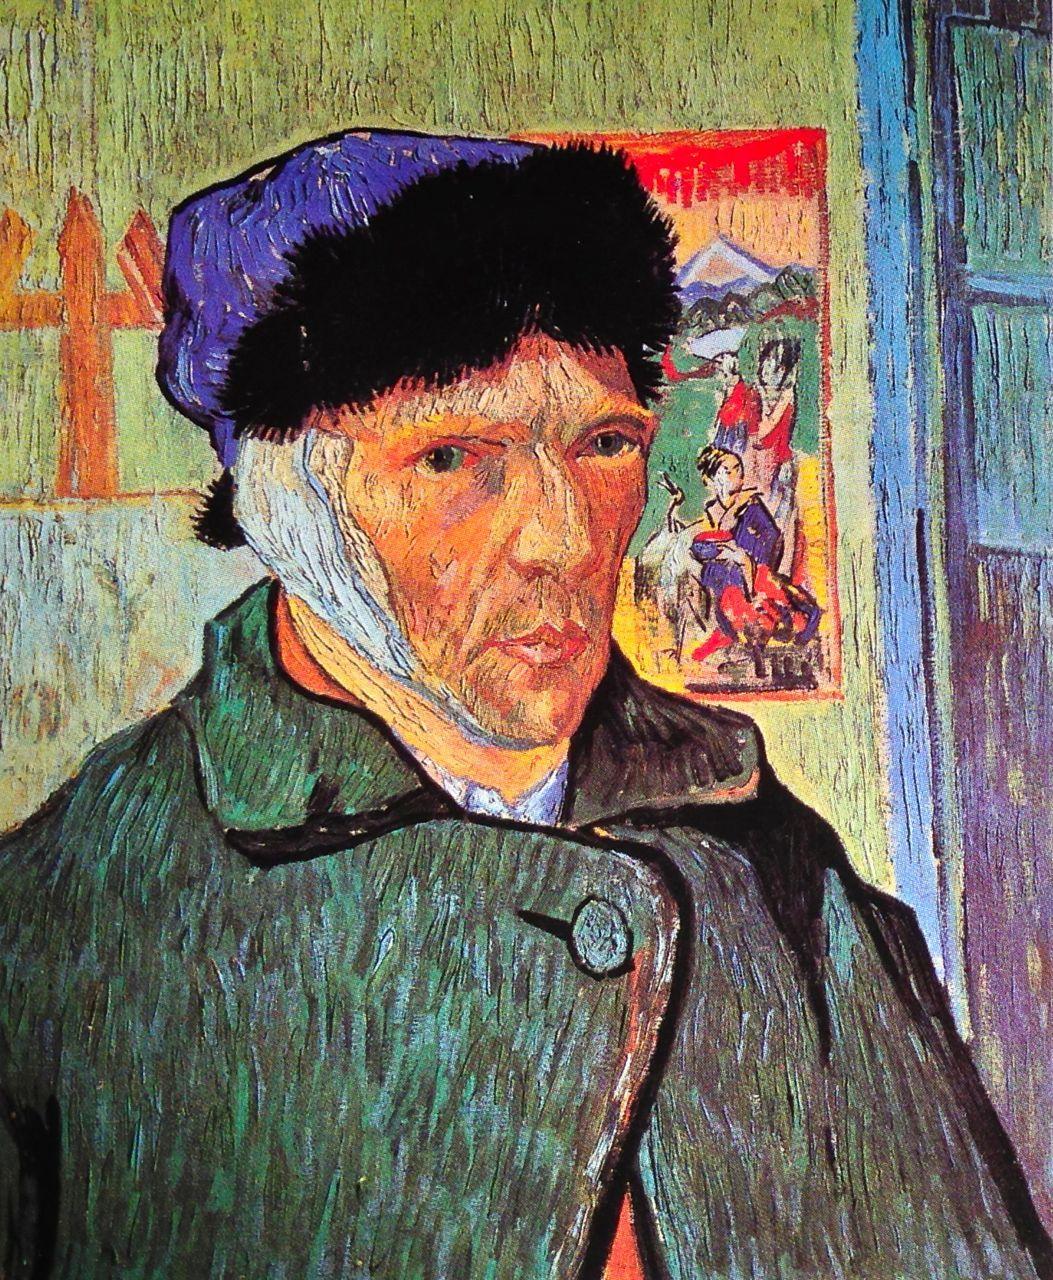 Vincent van Gogh. SelfPortrait with Bandaged Ear. Arles